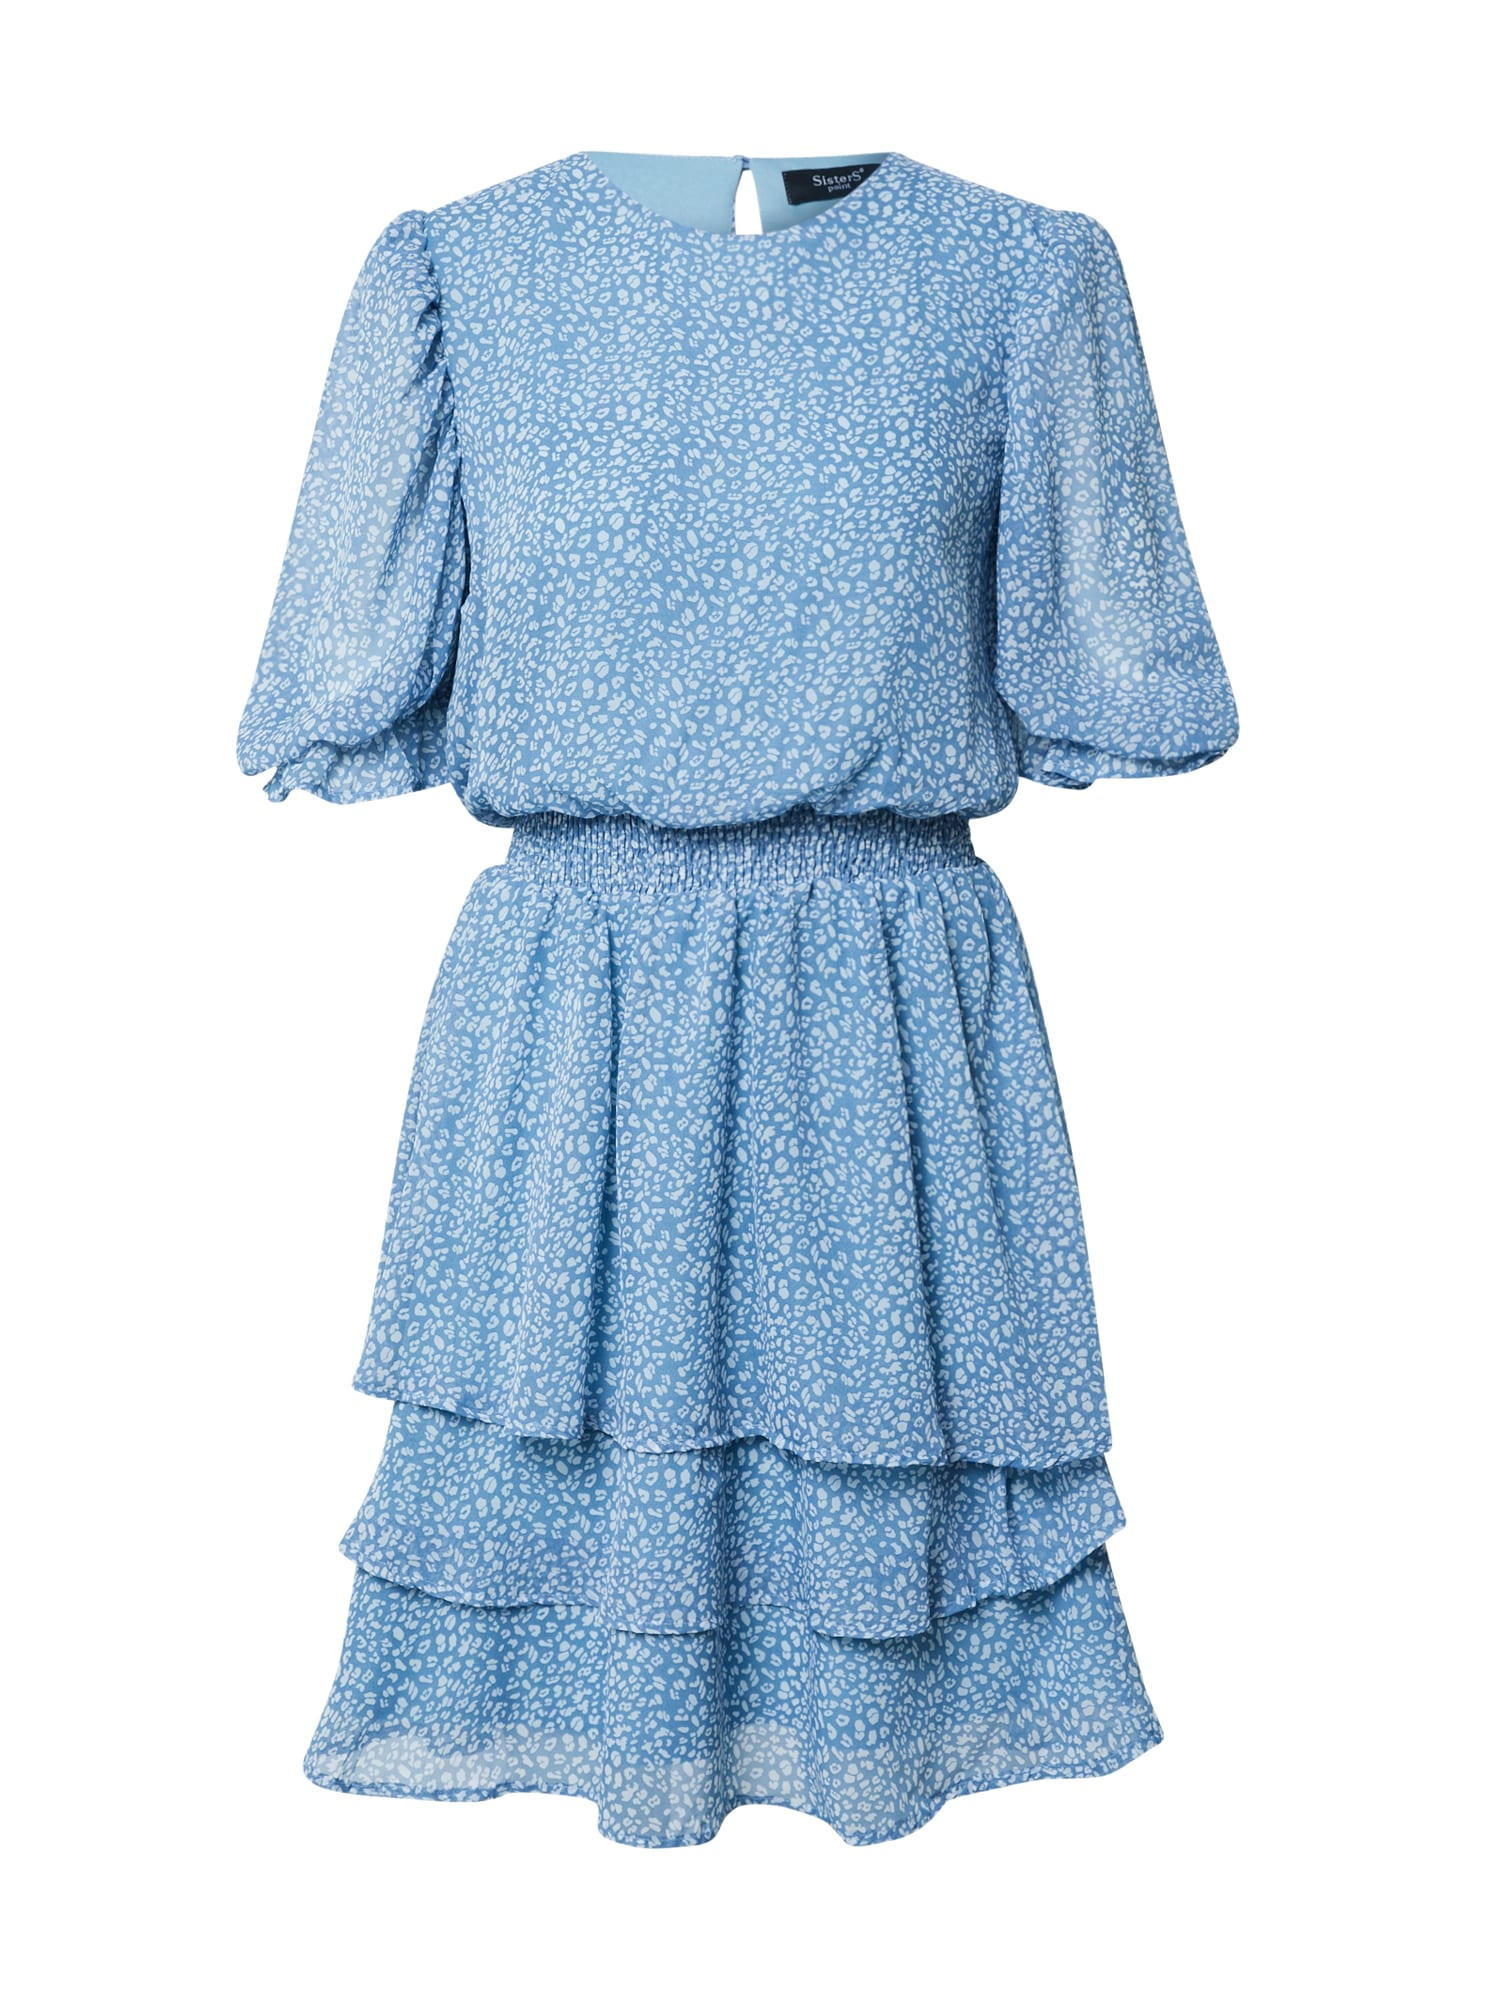 SISTERS POINT Šaty 'NICOLINE'  biela / dymovo modrá